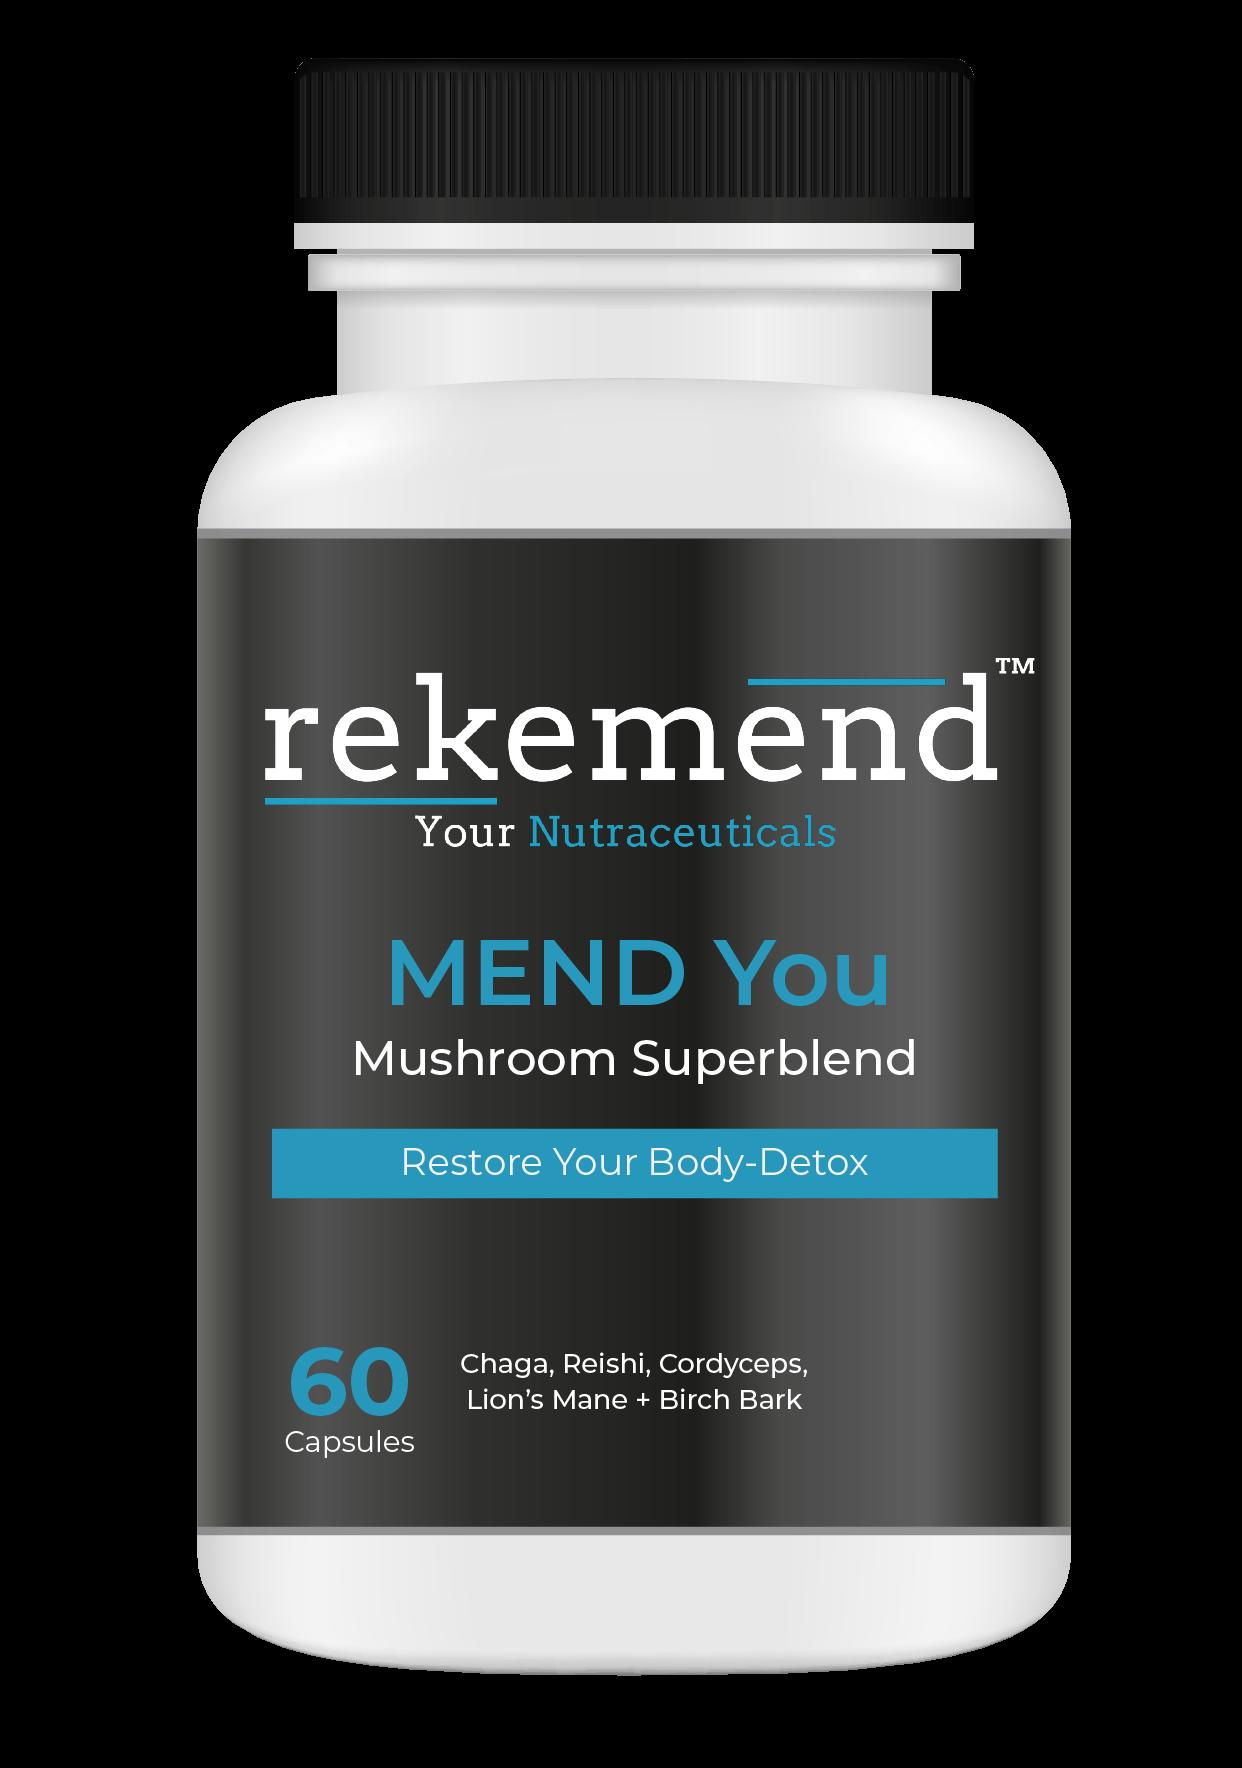 Mend You Mushroom Vitamin Supplement